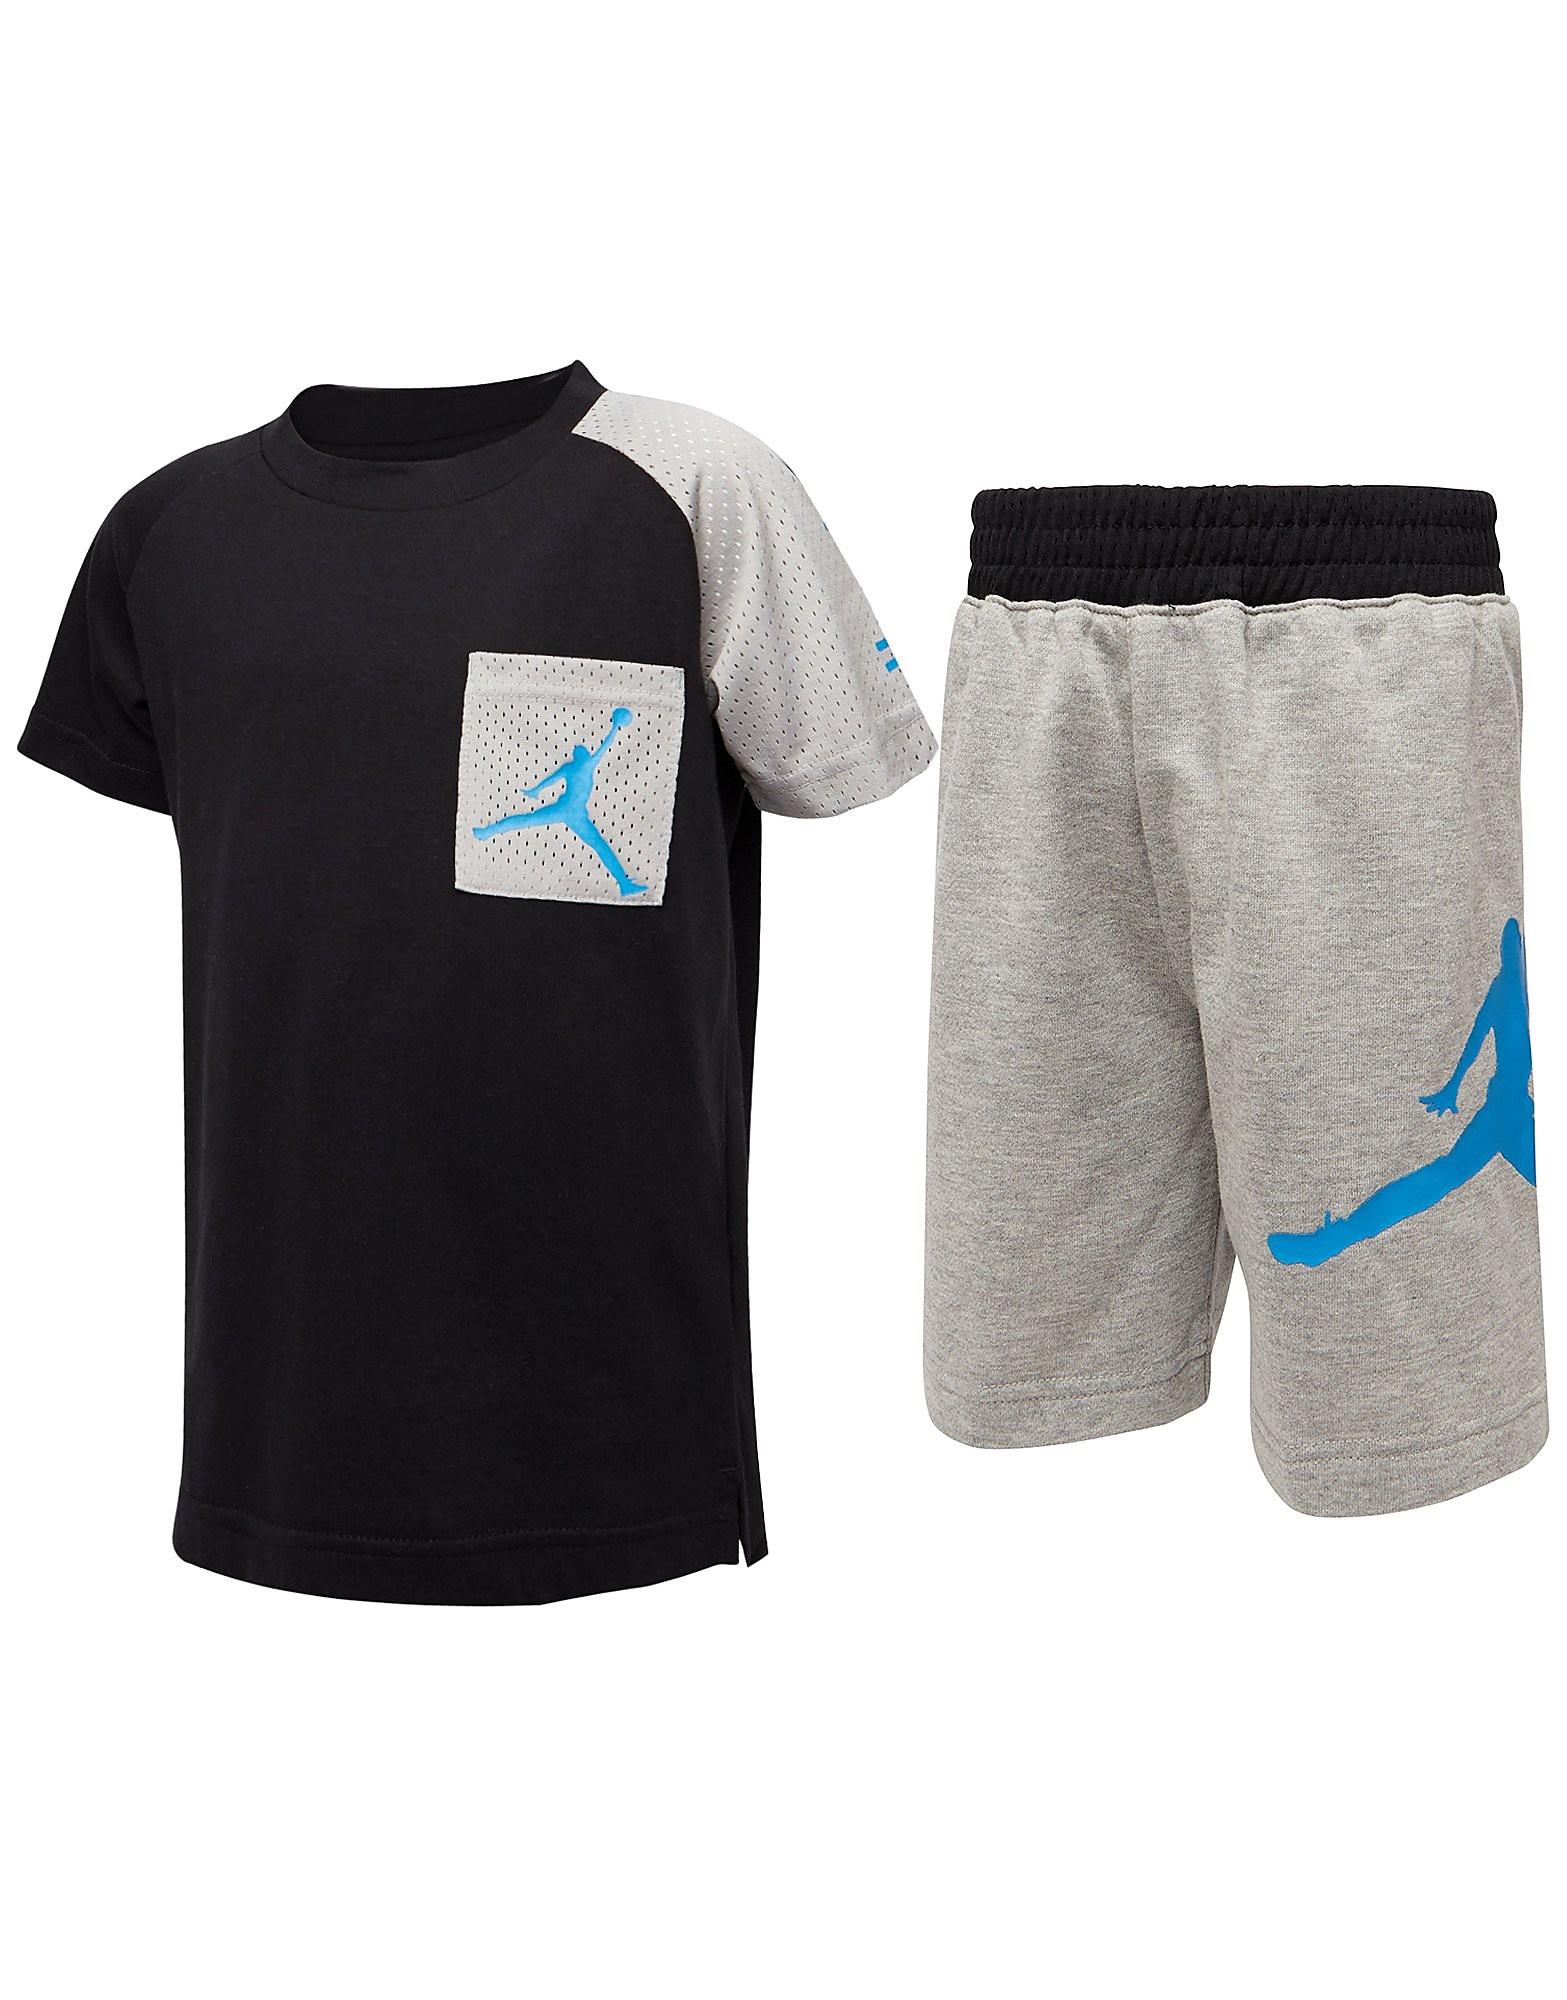 Jordan Air T-Shirt and Shorts Set Children